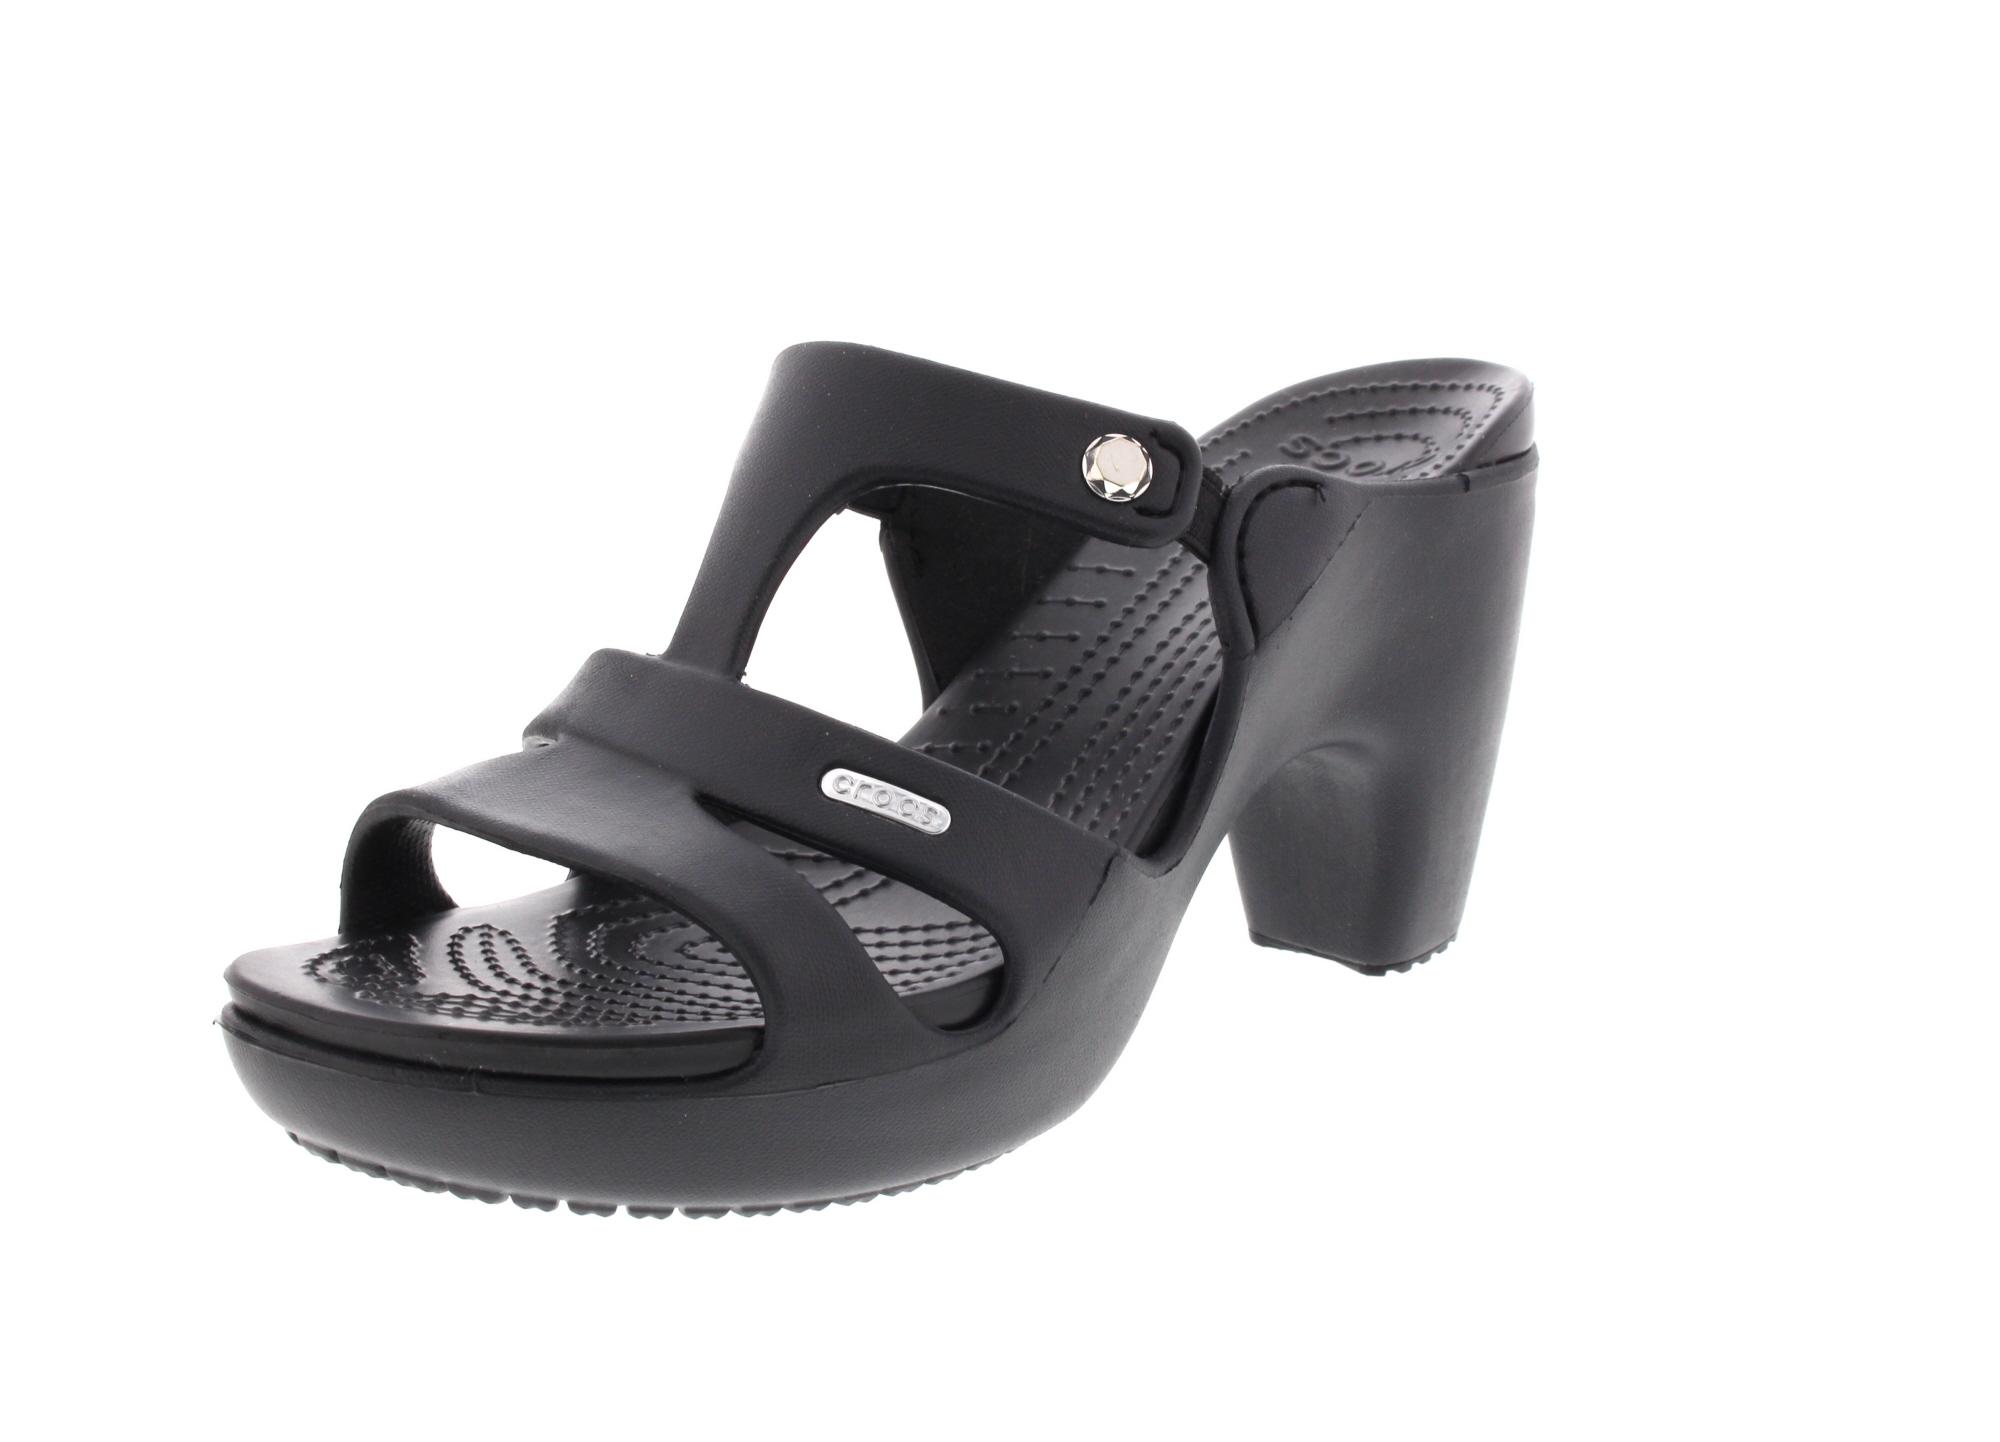 CROCS Damenschuhe - Pantolette CYPRUS V HEEL - black0